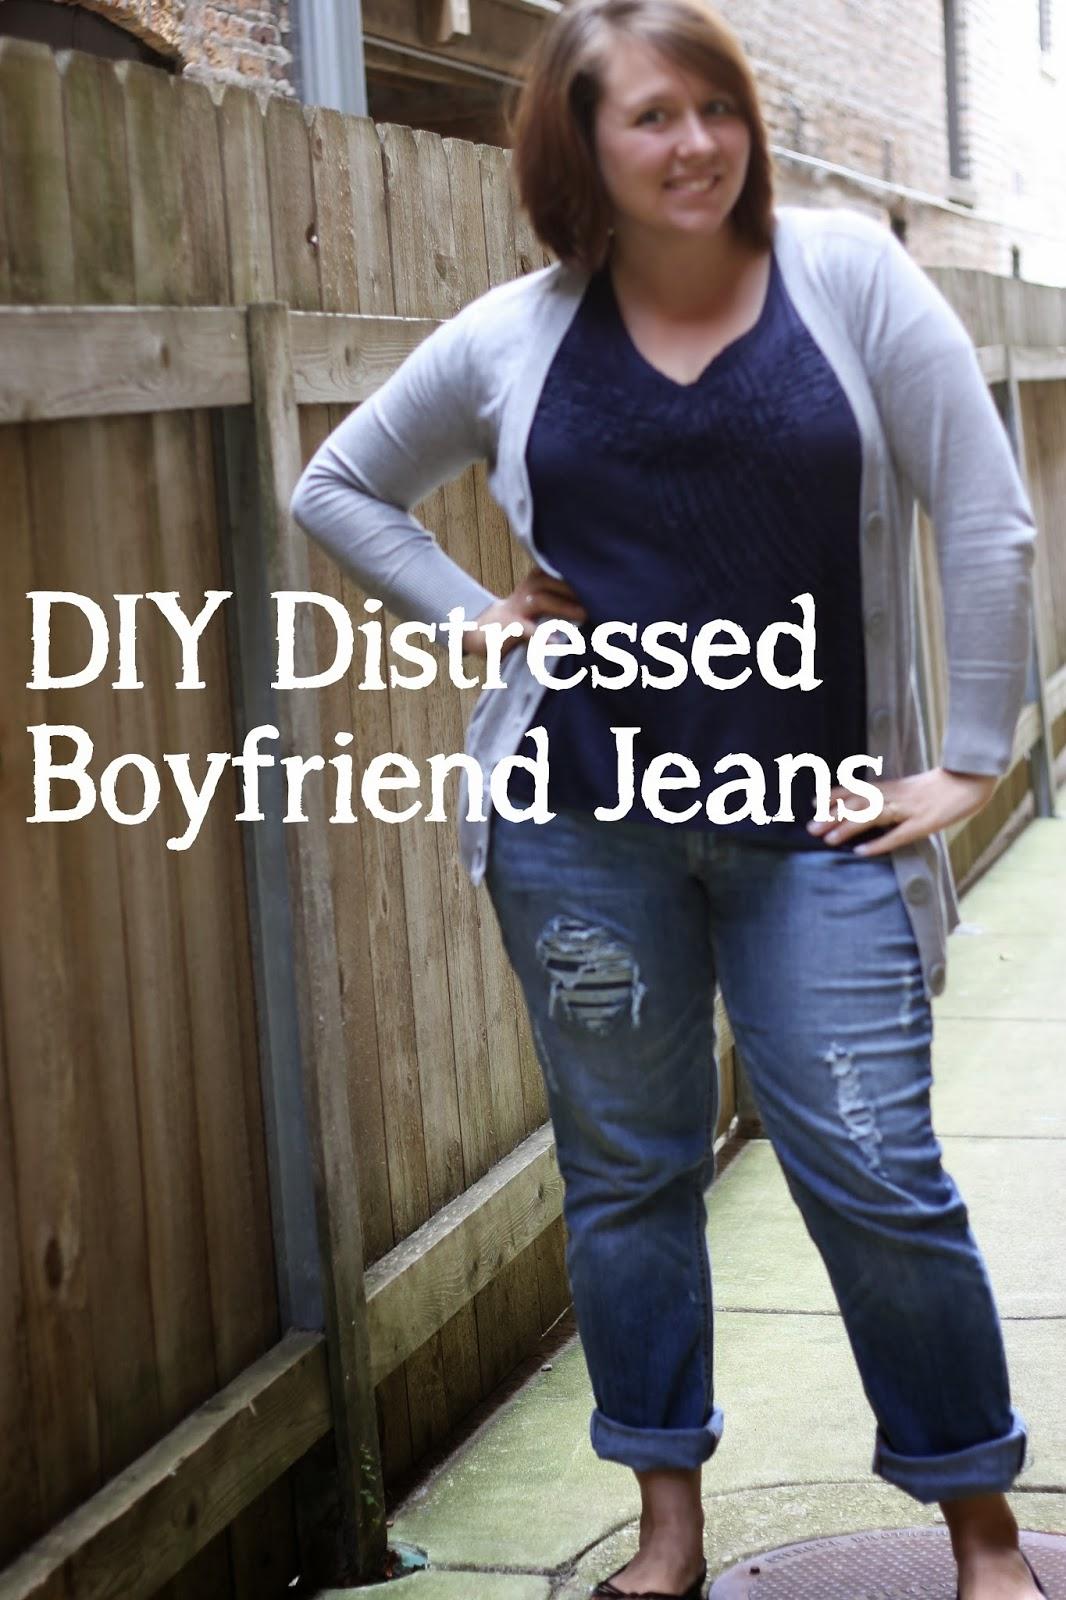 Murrayed Life: DIY Distressed Boyfriend Jeans Diy Distressed Boyfriend Jeans